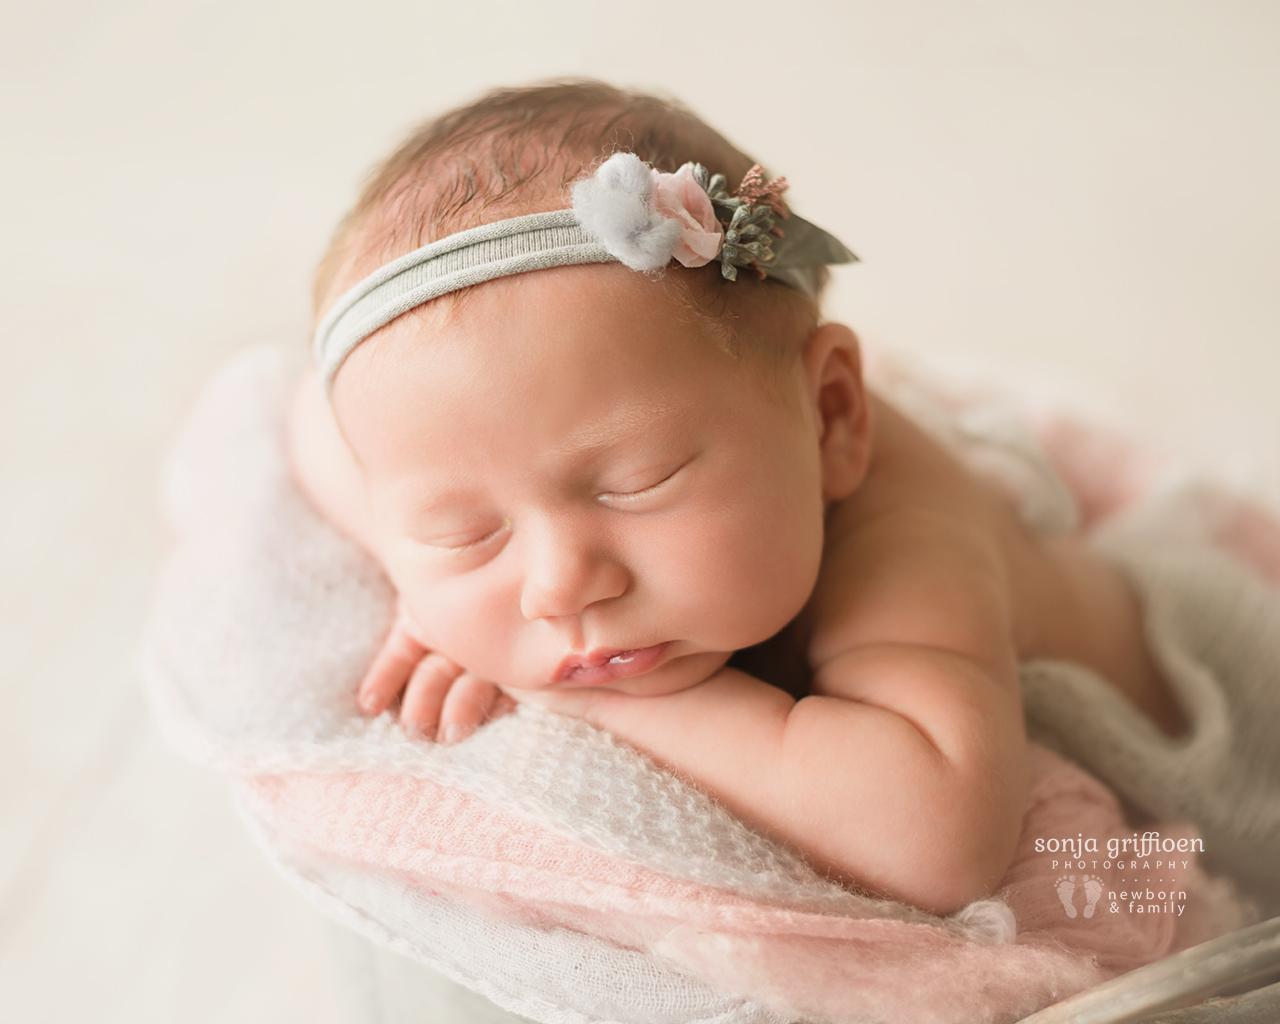 Anneke-Newborn-Brisbane-Newborn-Photographer-Sonja-Griffioen-21.jpg